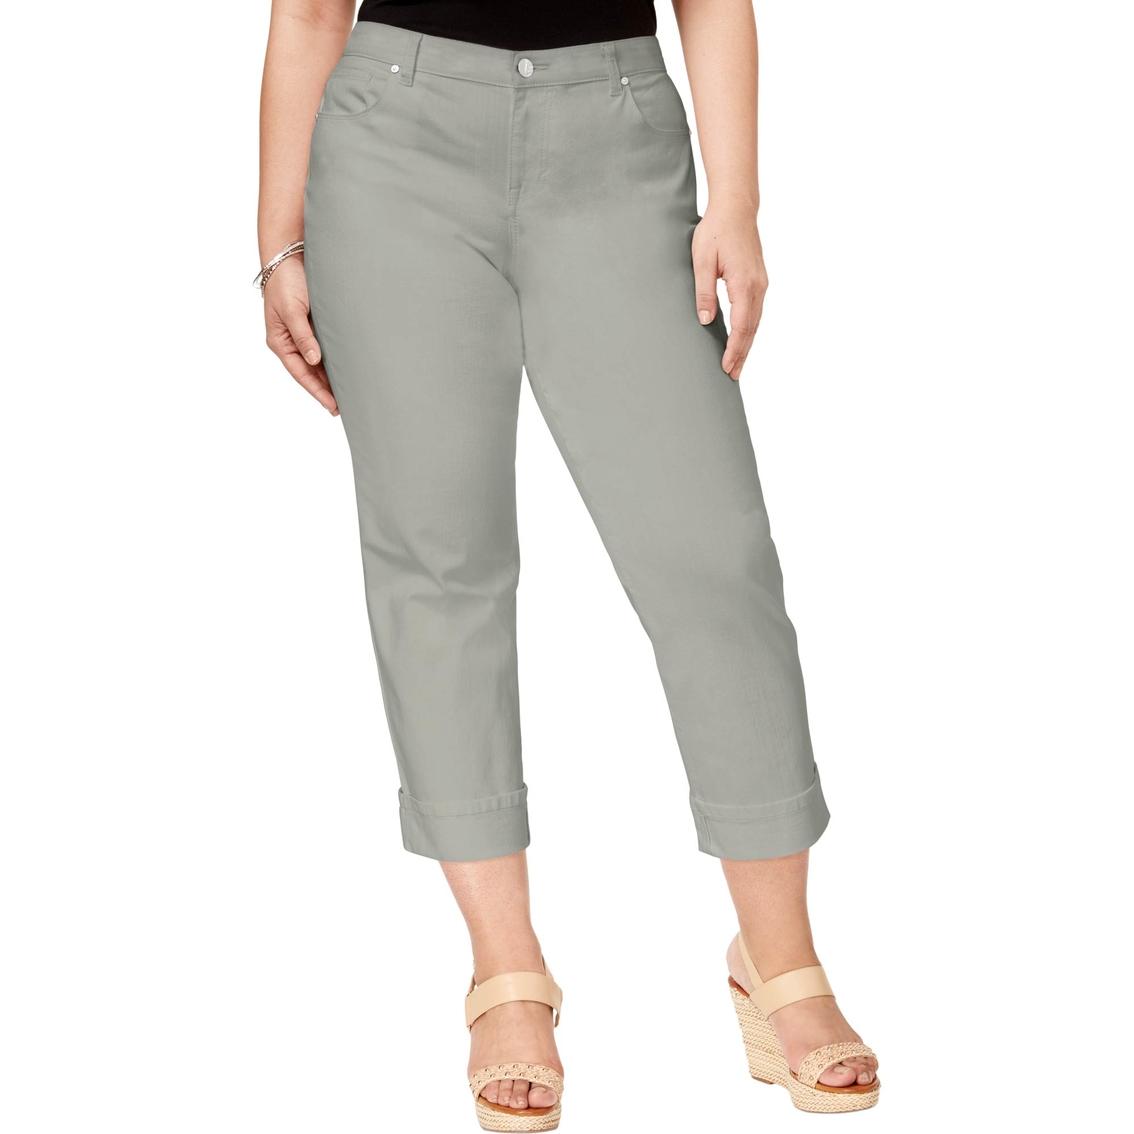 Style & Co. Plus Size Denim Capri Pants | Pants | Apparel ...